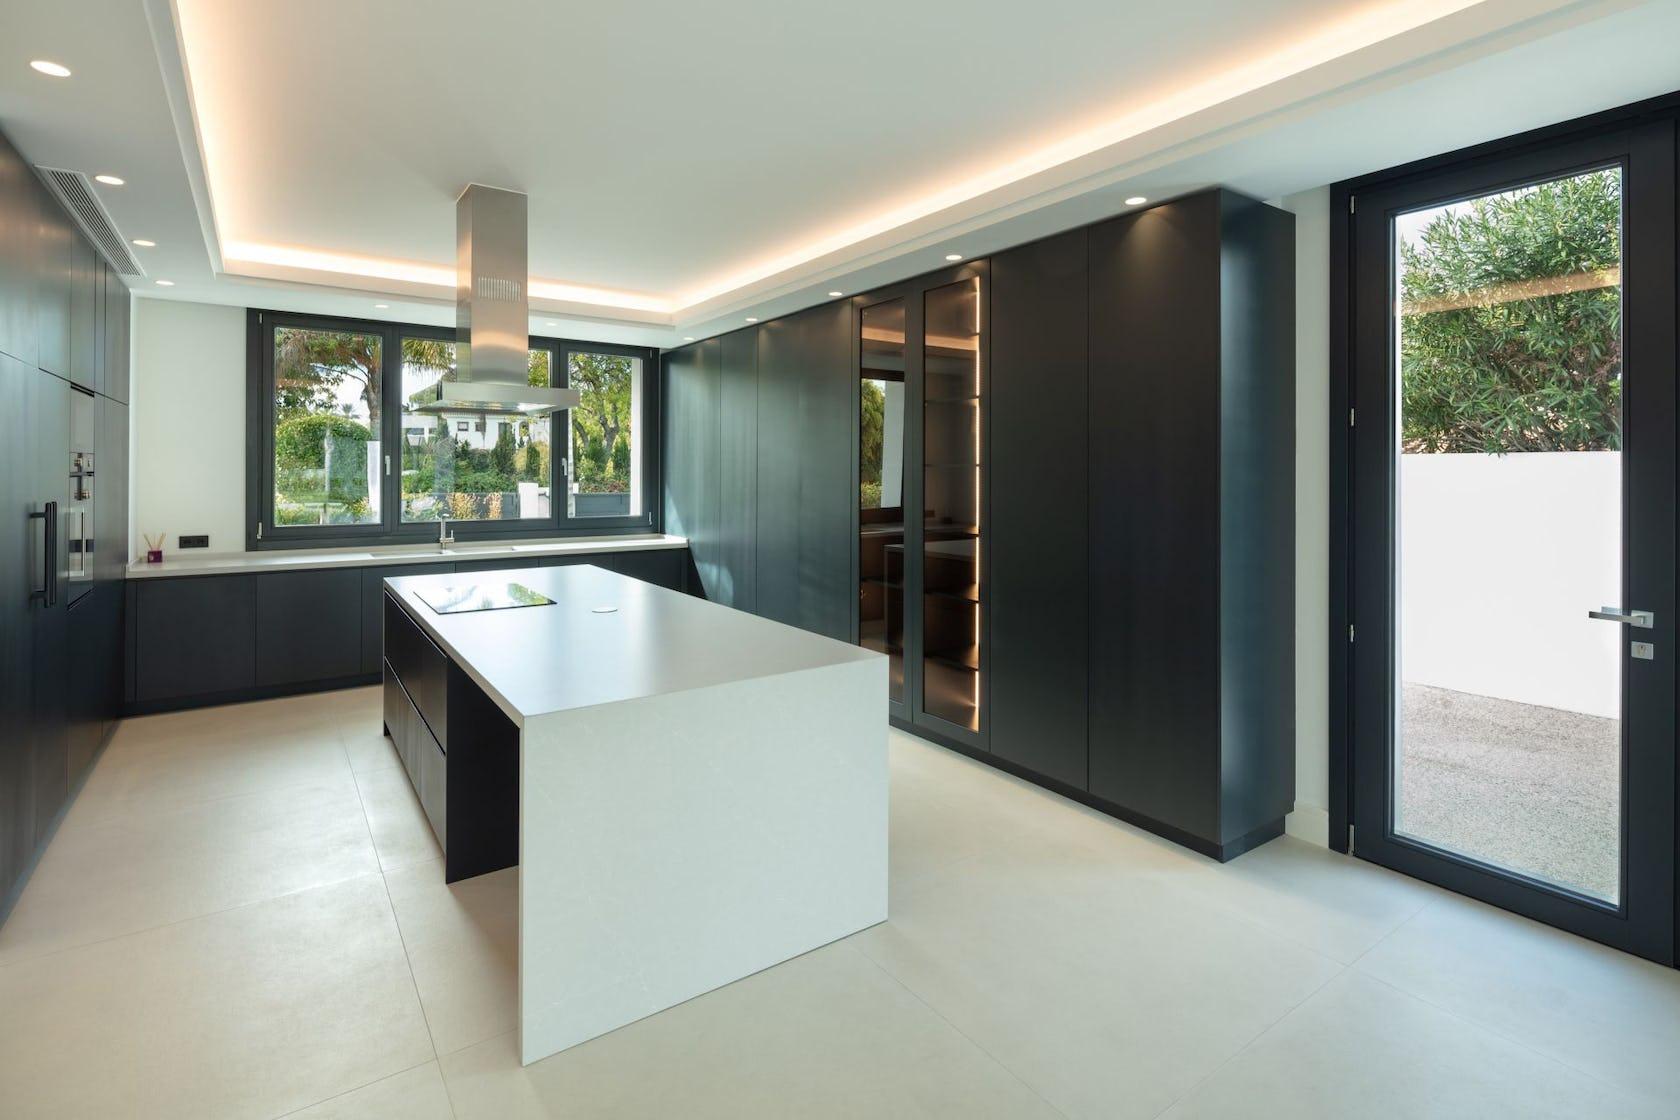 indoors flooring room furniture interior design floor kitchen